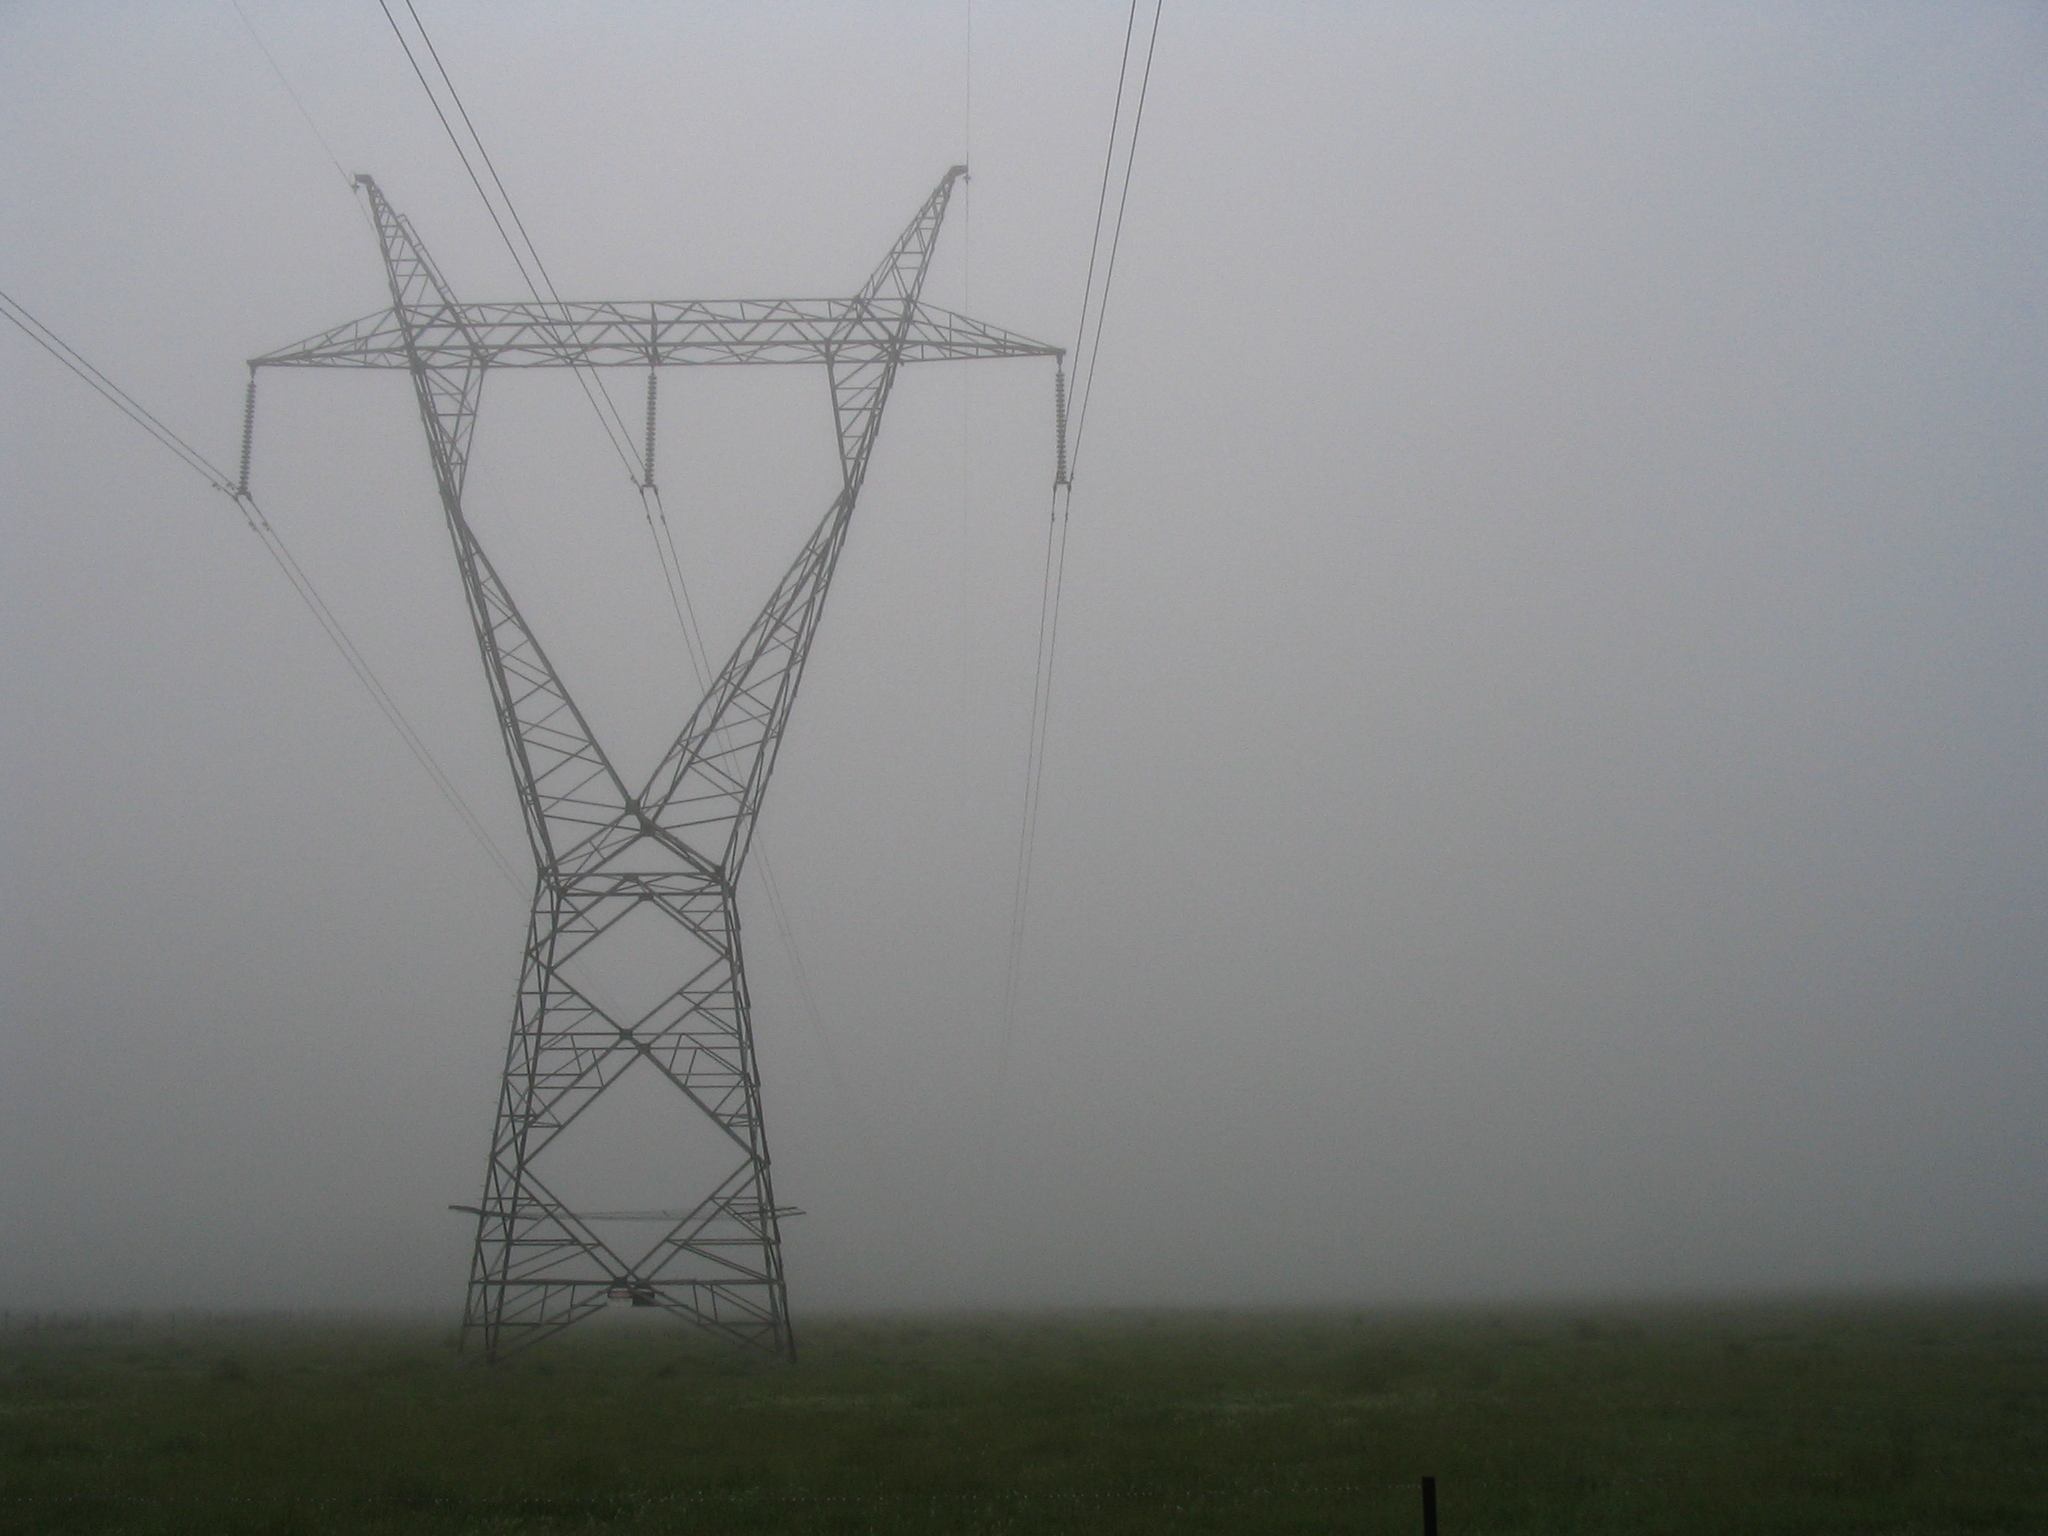 Power pylon in the fog, in a grassy paddock